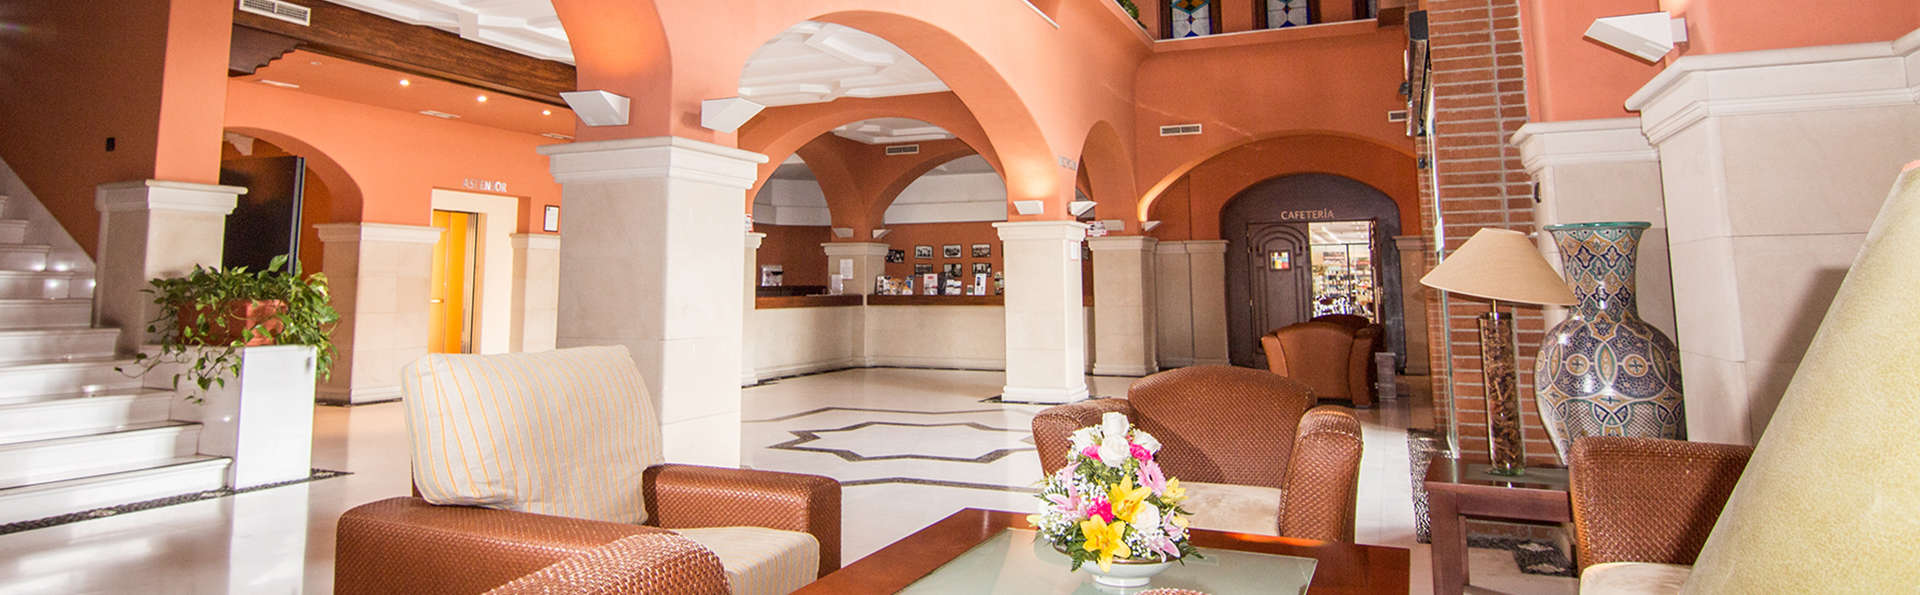 Hotel Abades Guadix - Edit_Lobby.jpg